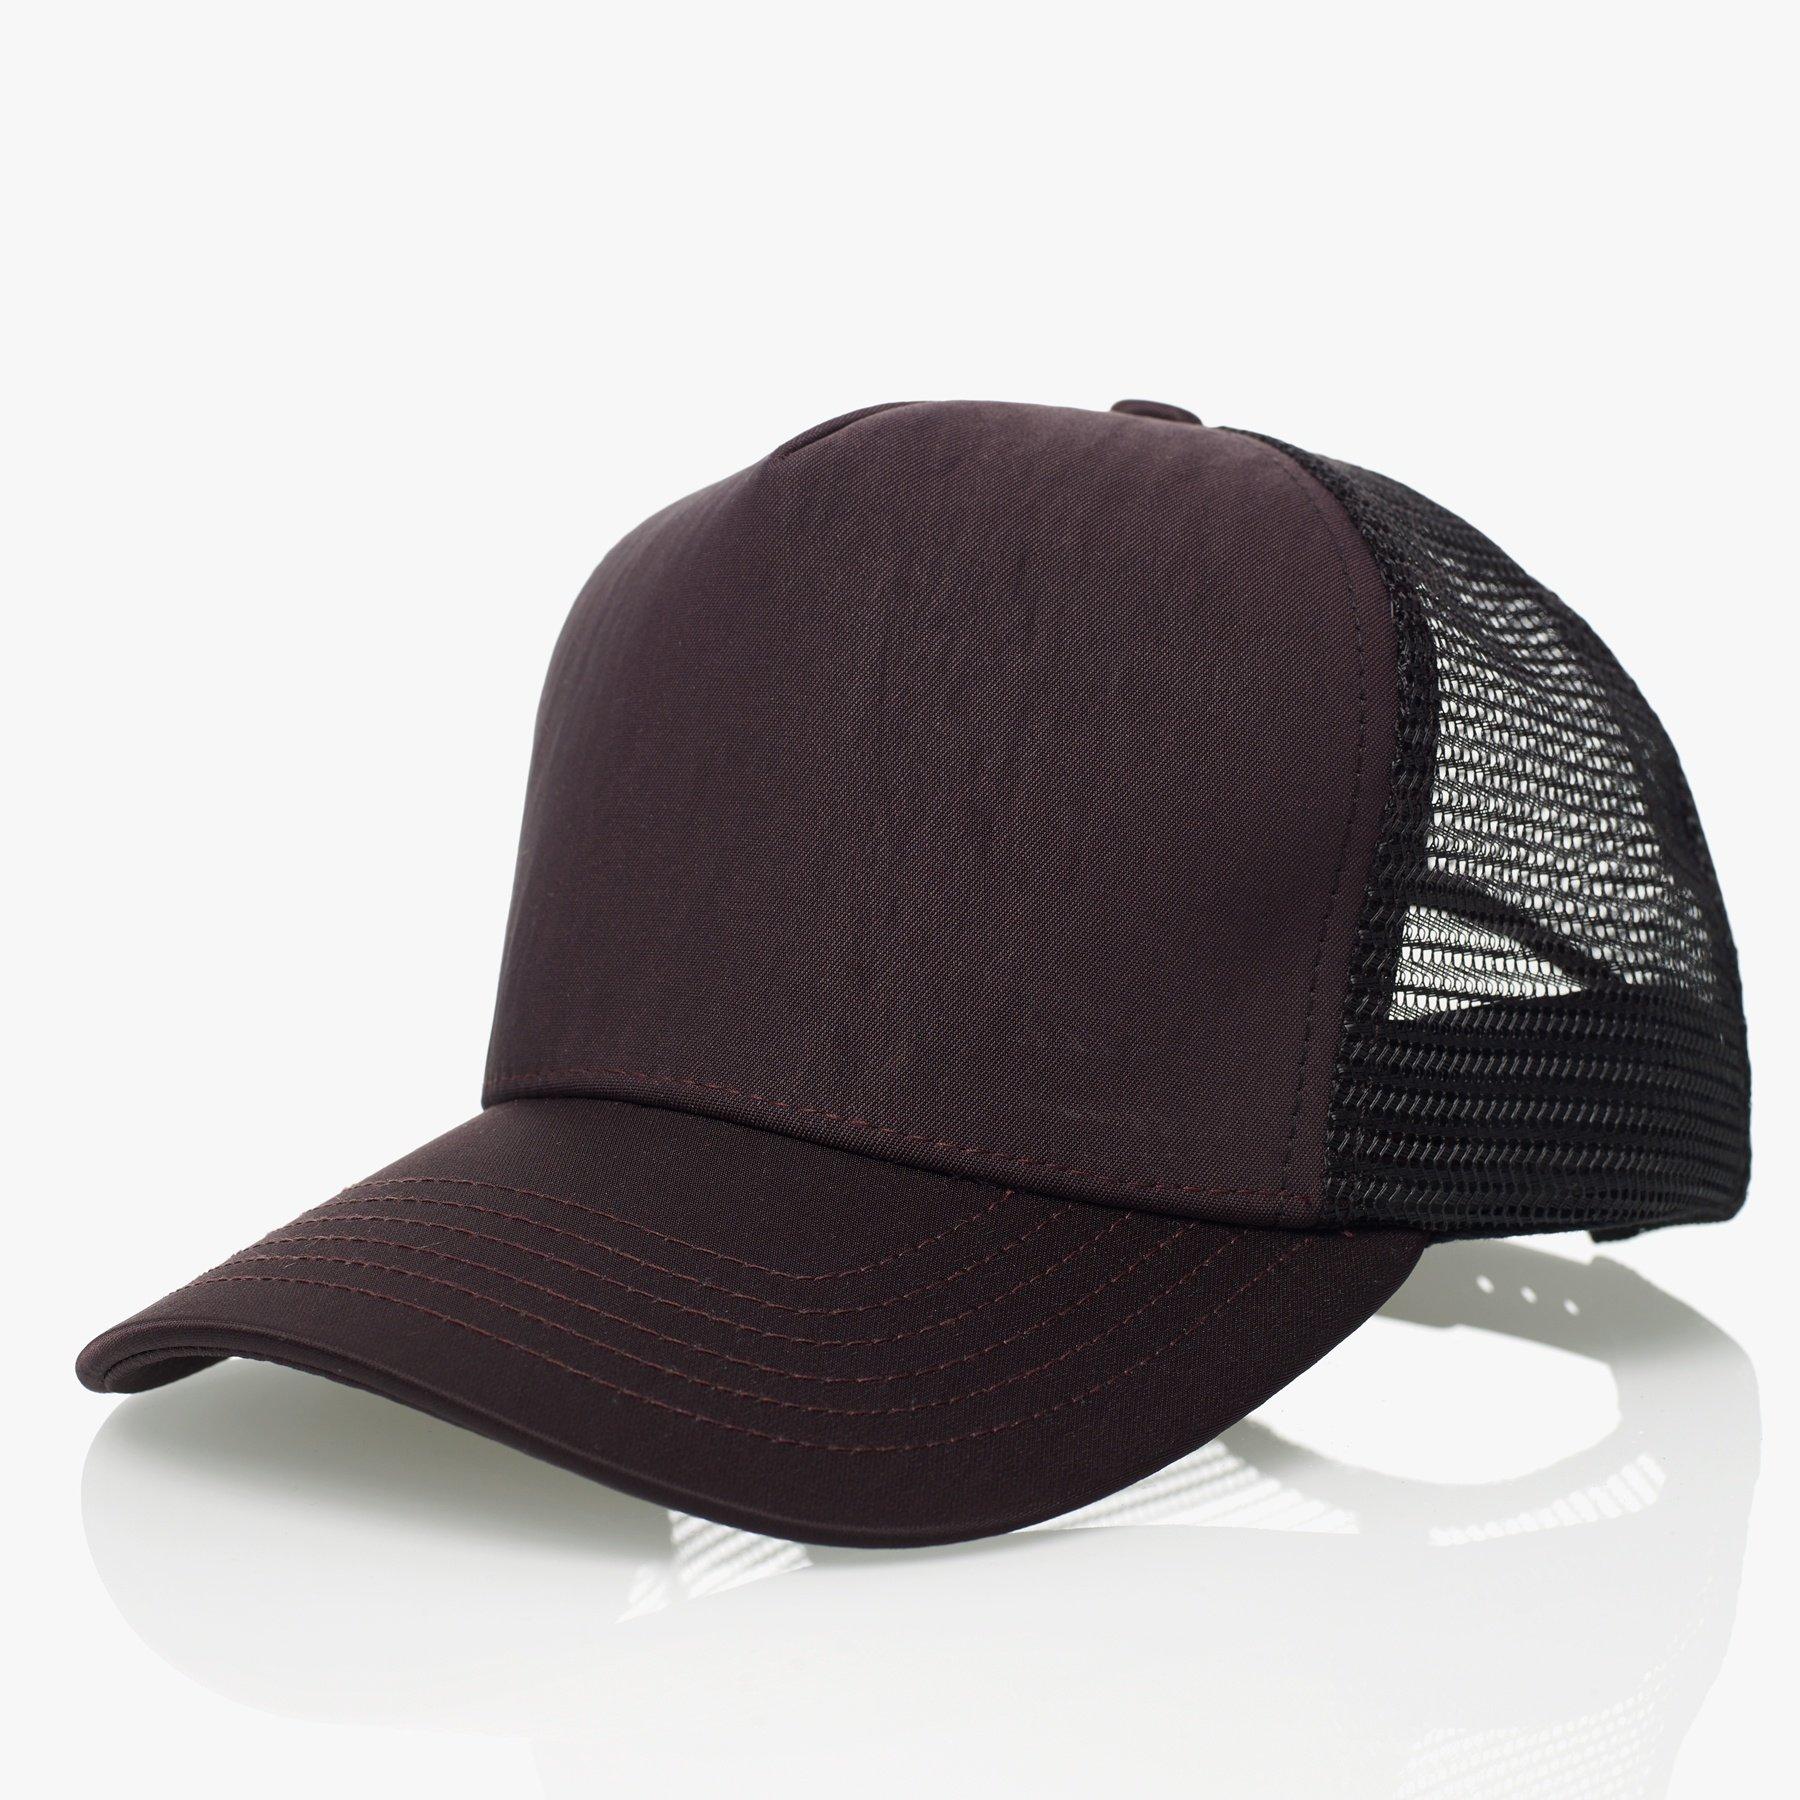 Lyst james perse double face nylon trucker hat online exclusive jpg  1800x1800 James perse hats dd73166cbf30